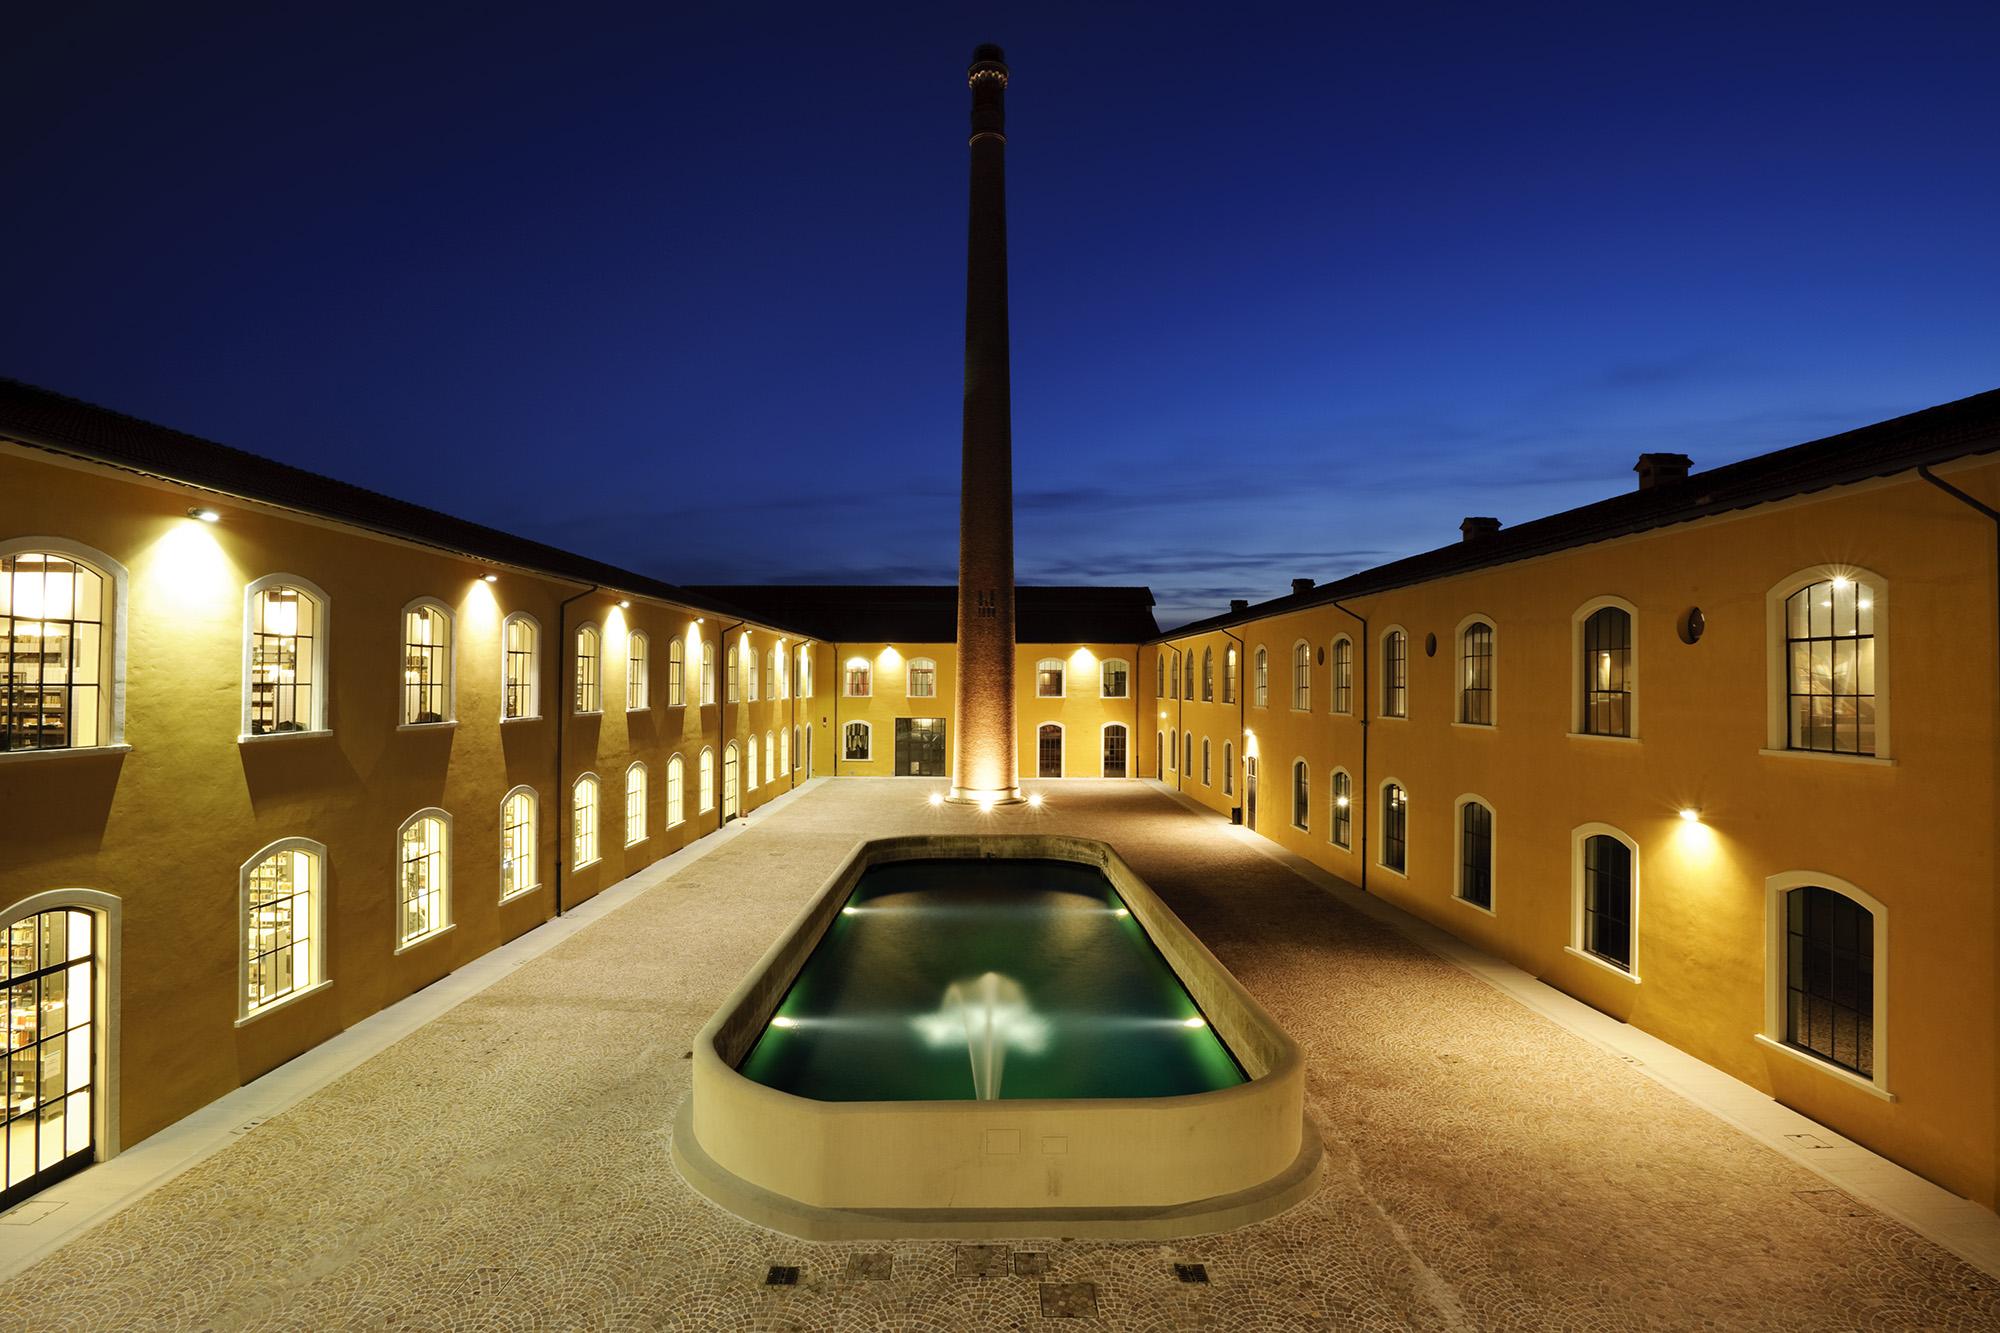 Garc_Restauro_PRATO EX CAMPOLMI_Garc_Carpi_Modena_Costruzioni_Ambiente